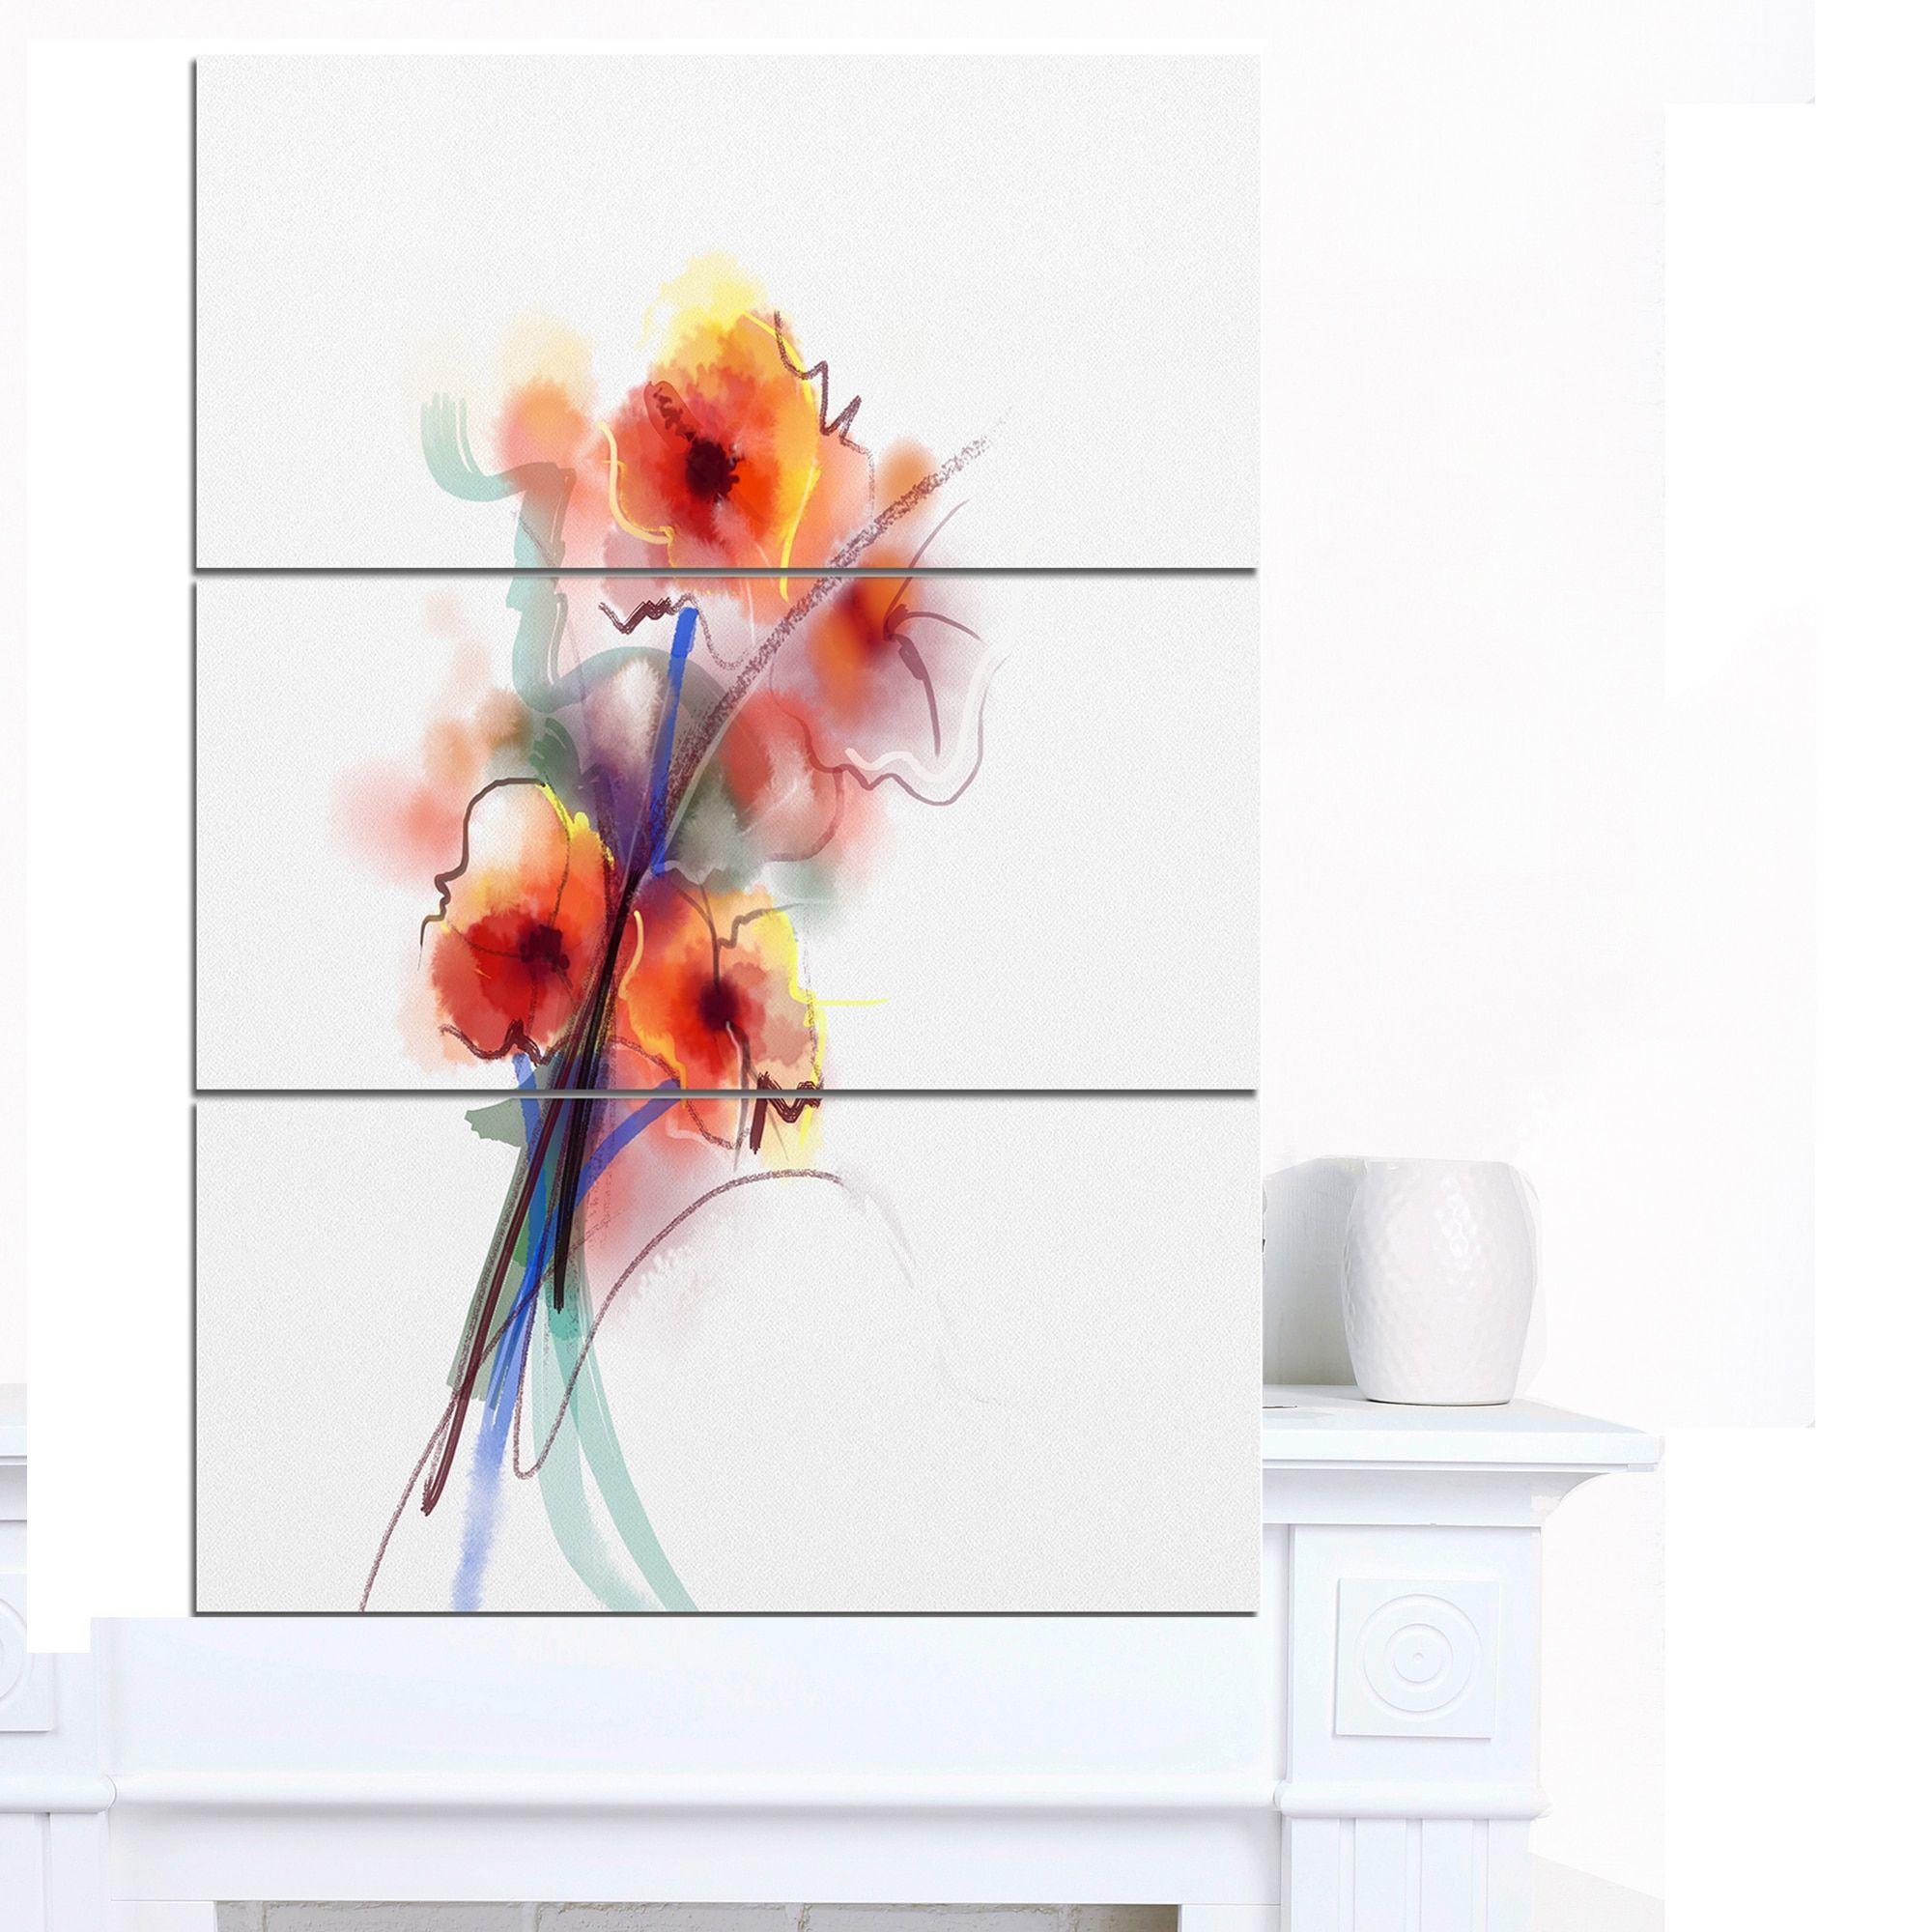 Designart 'Soft Color Flowers on Background' Modern Floral Wall Art Canvas